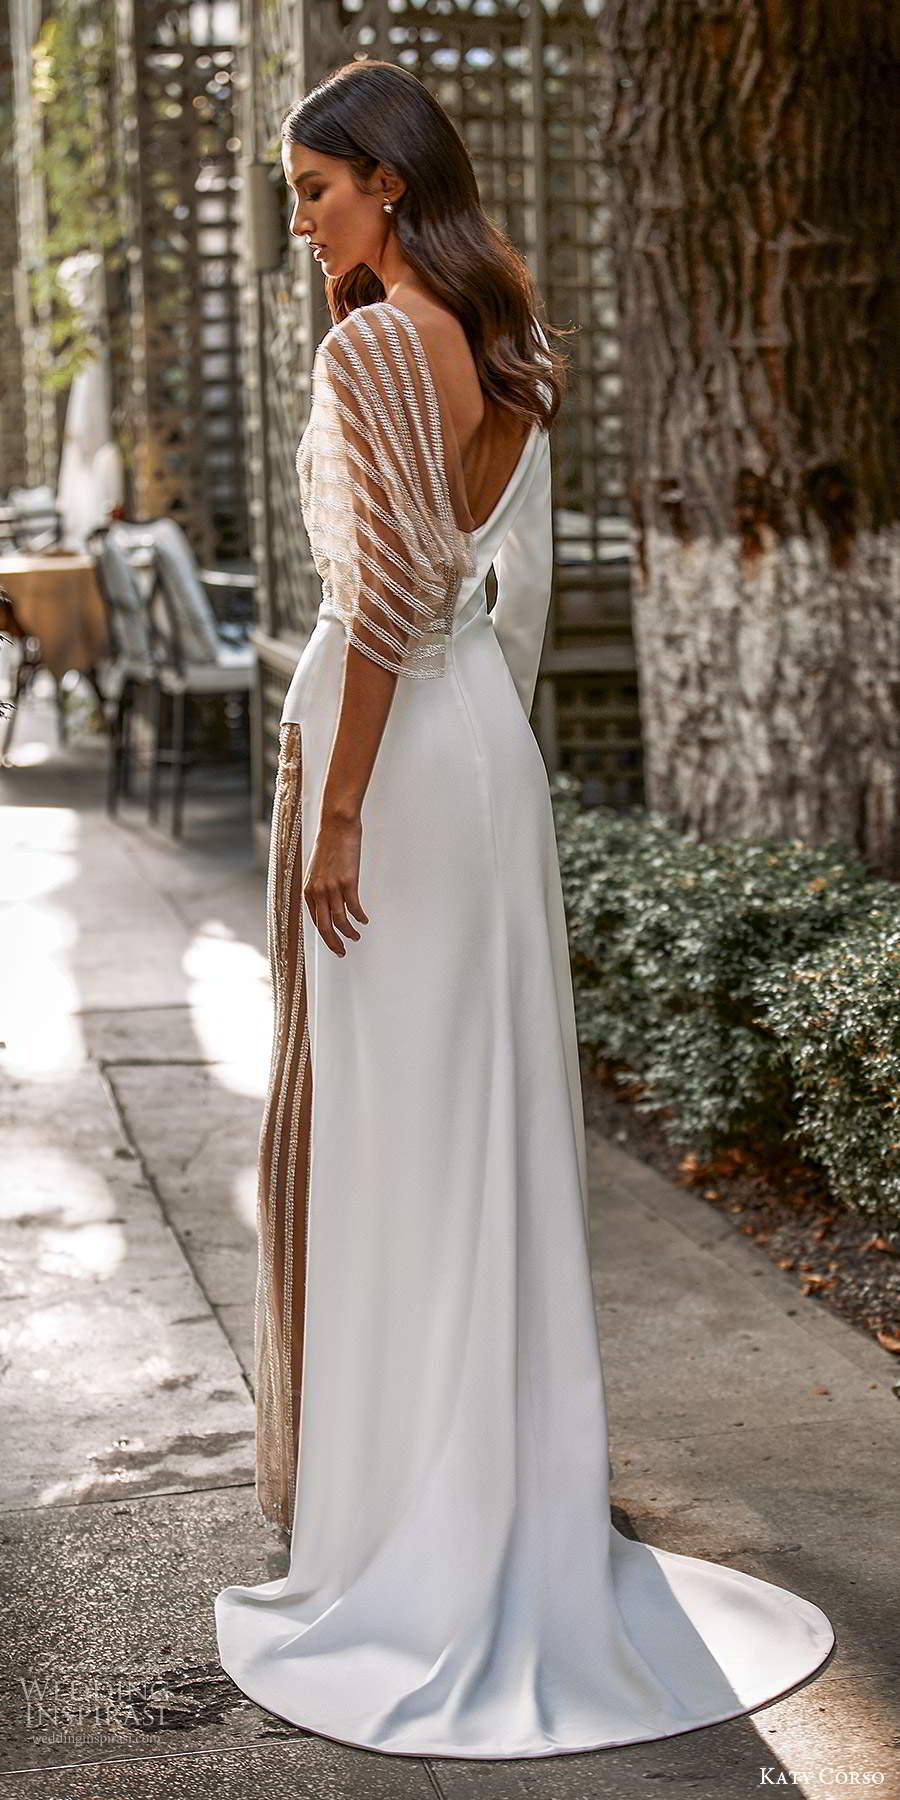 katy corso 2021 bridal long sleeve collar v neckline clean minimalist pant a line wedding dress (3) bv